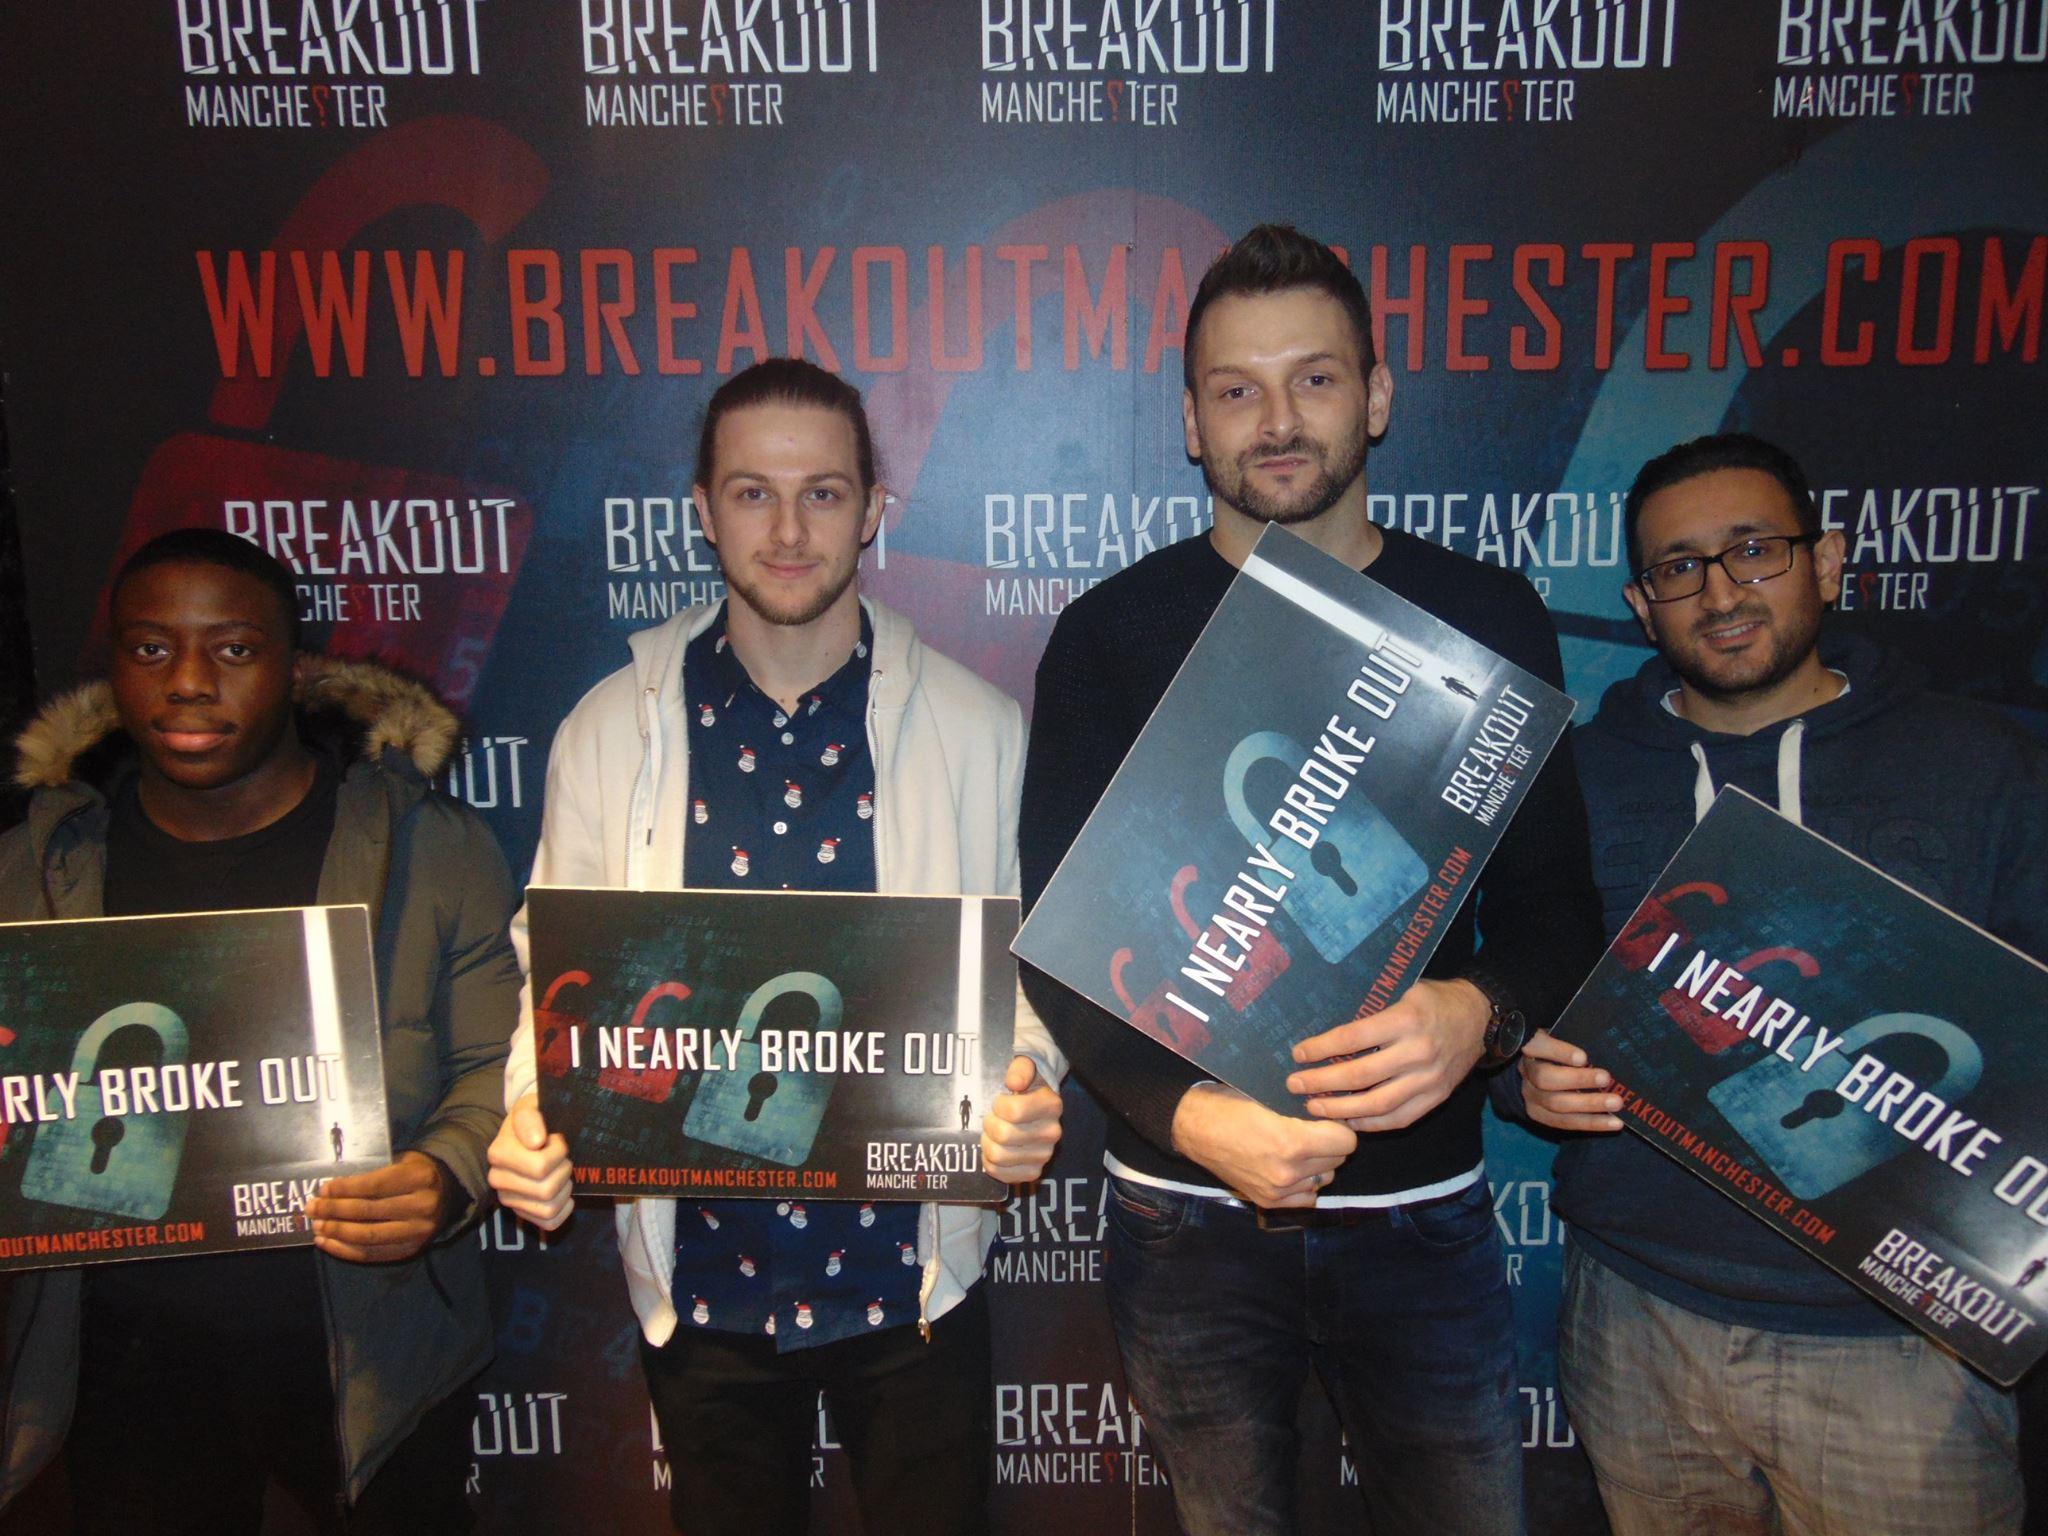 Cets_Alex_Peter_Bash Team Breakout.jpg